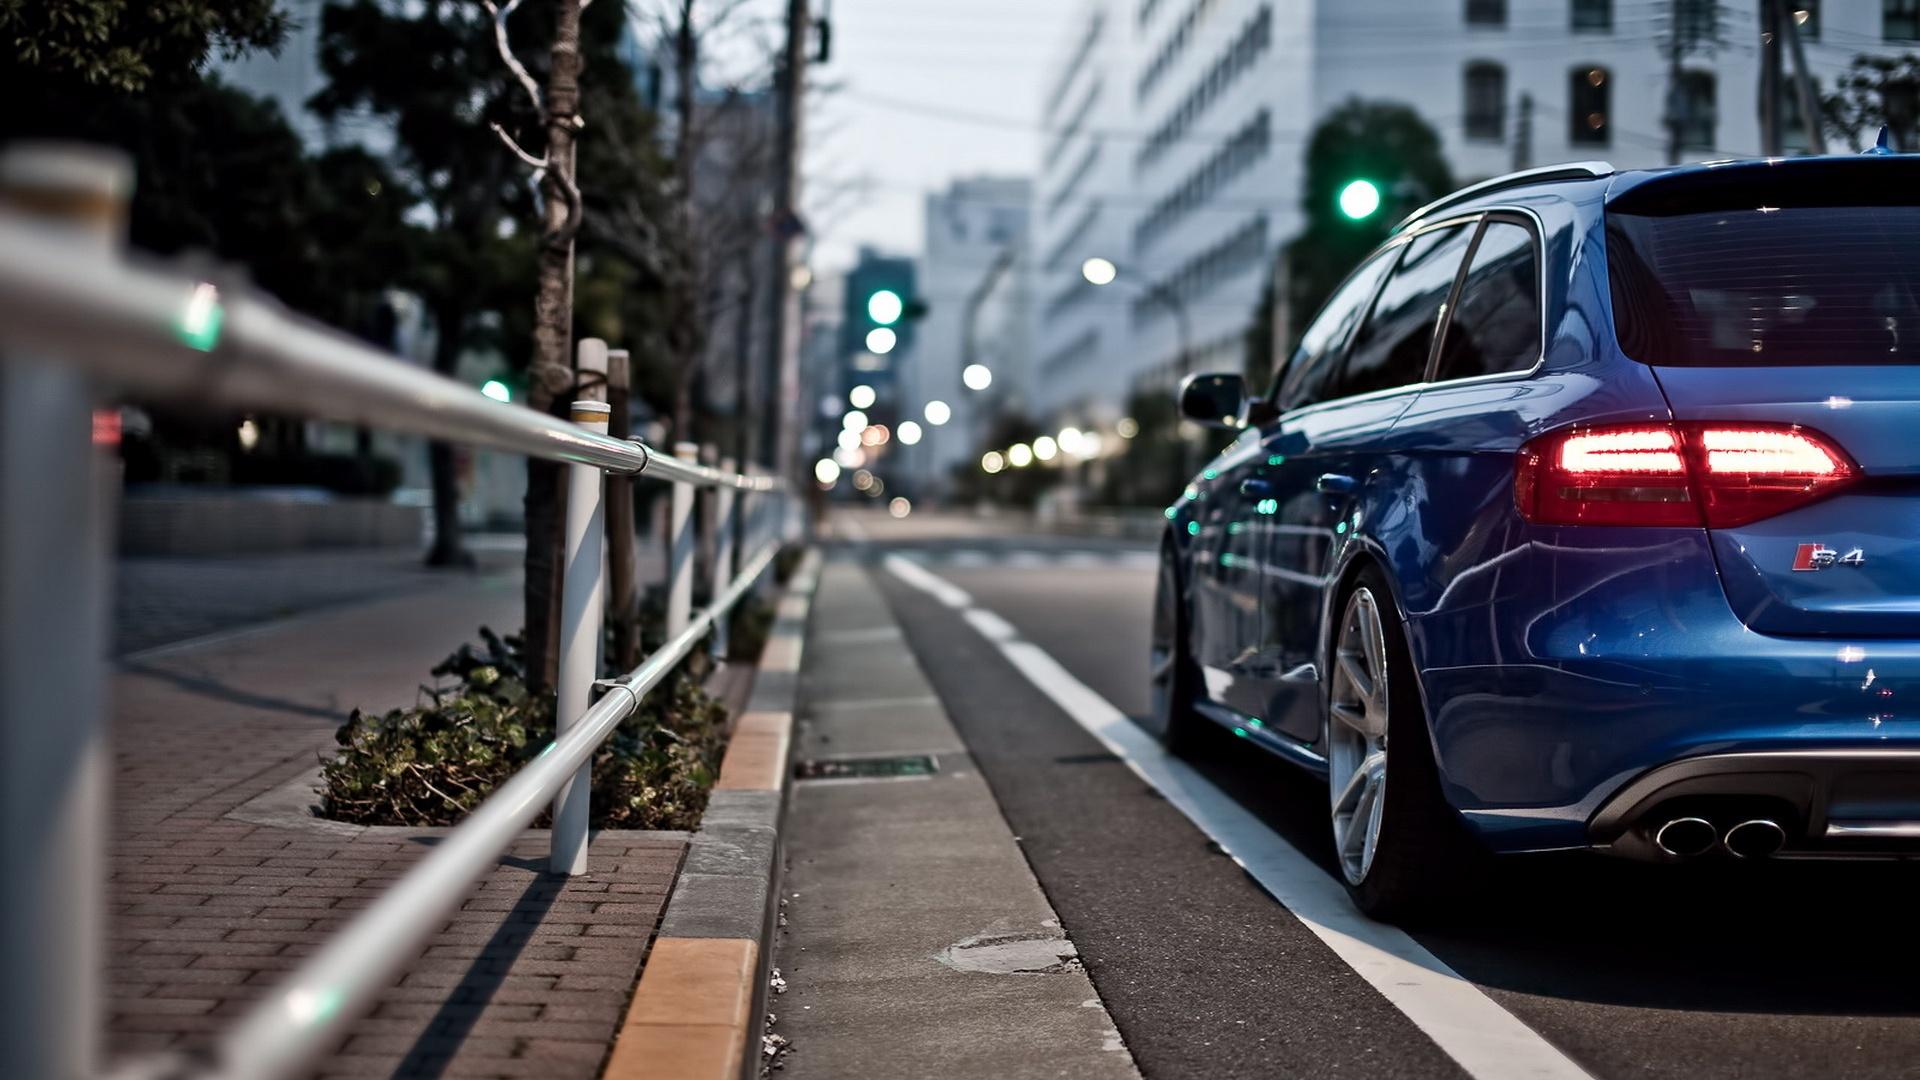 Audi S4 Wallpaper Download HD Wallpapers 1920x1080